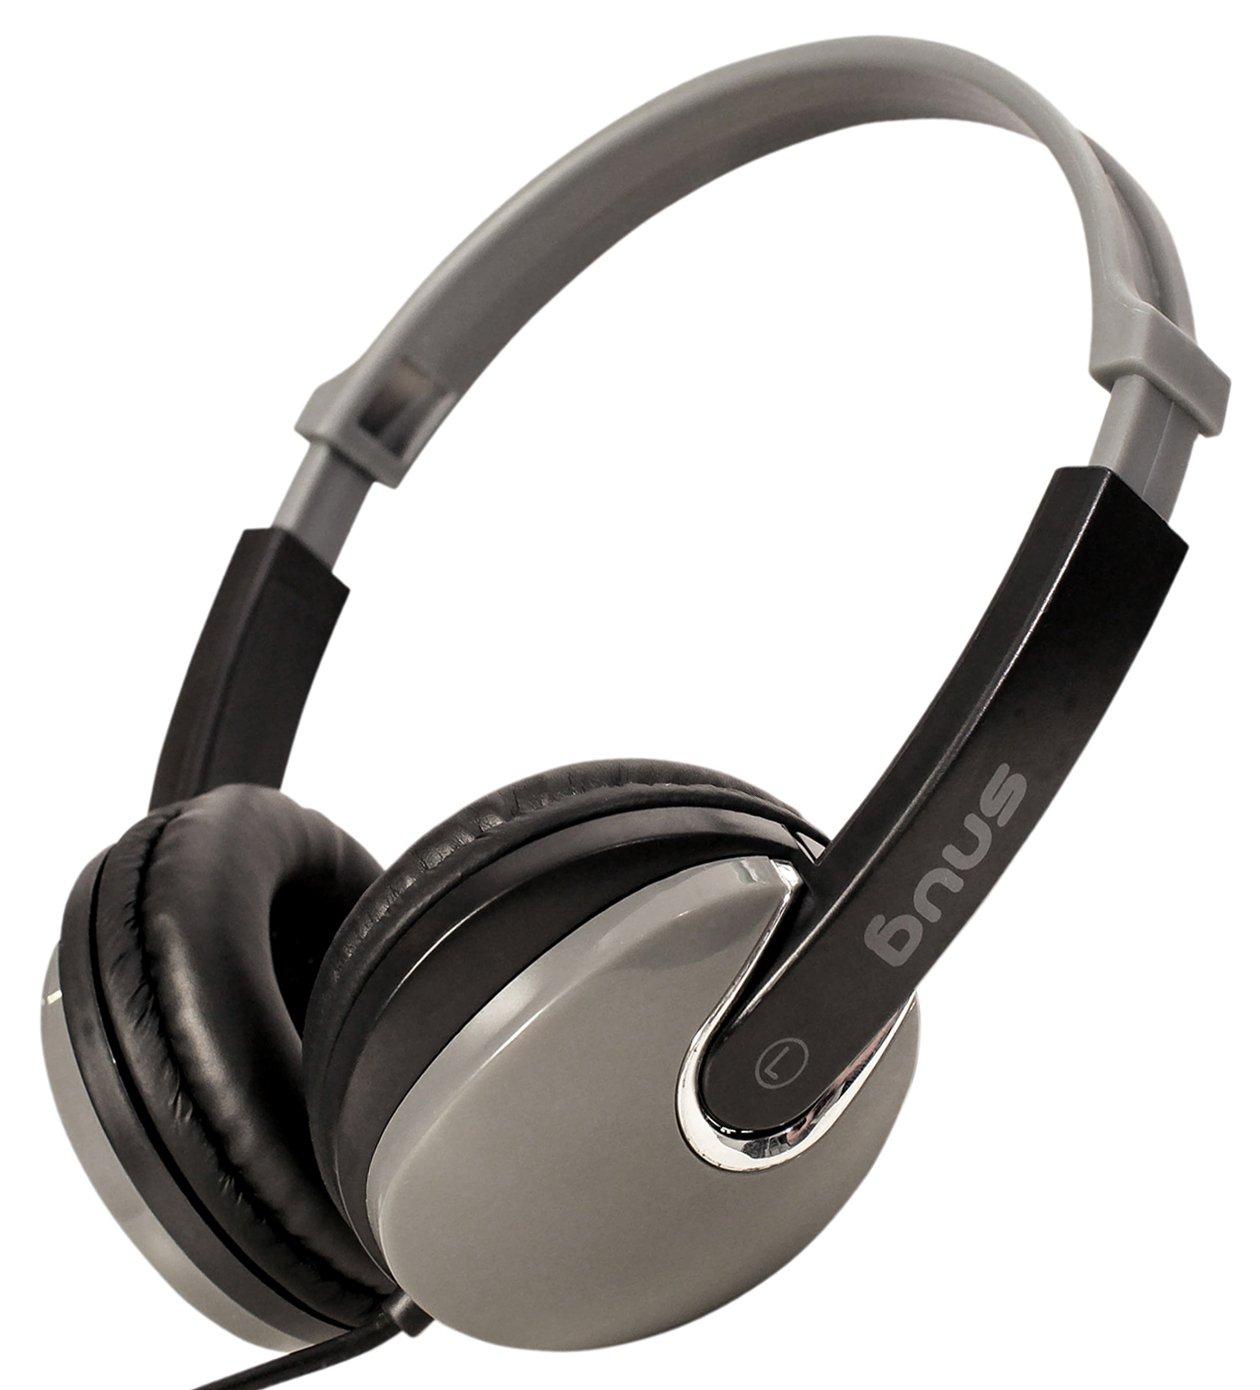 Black Snug Plug n Play Kids Headphones for Children DJ Style